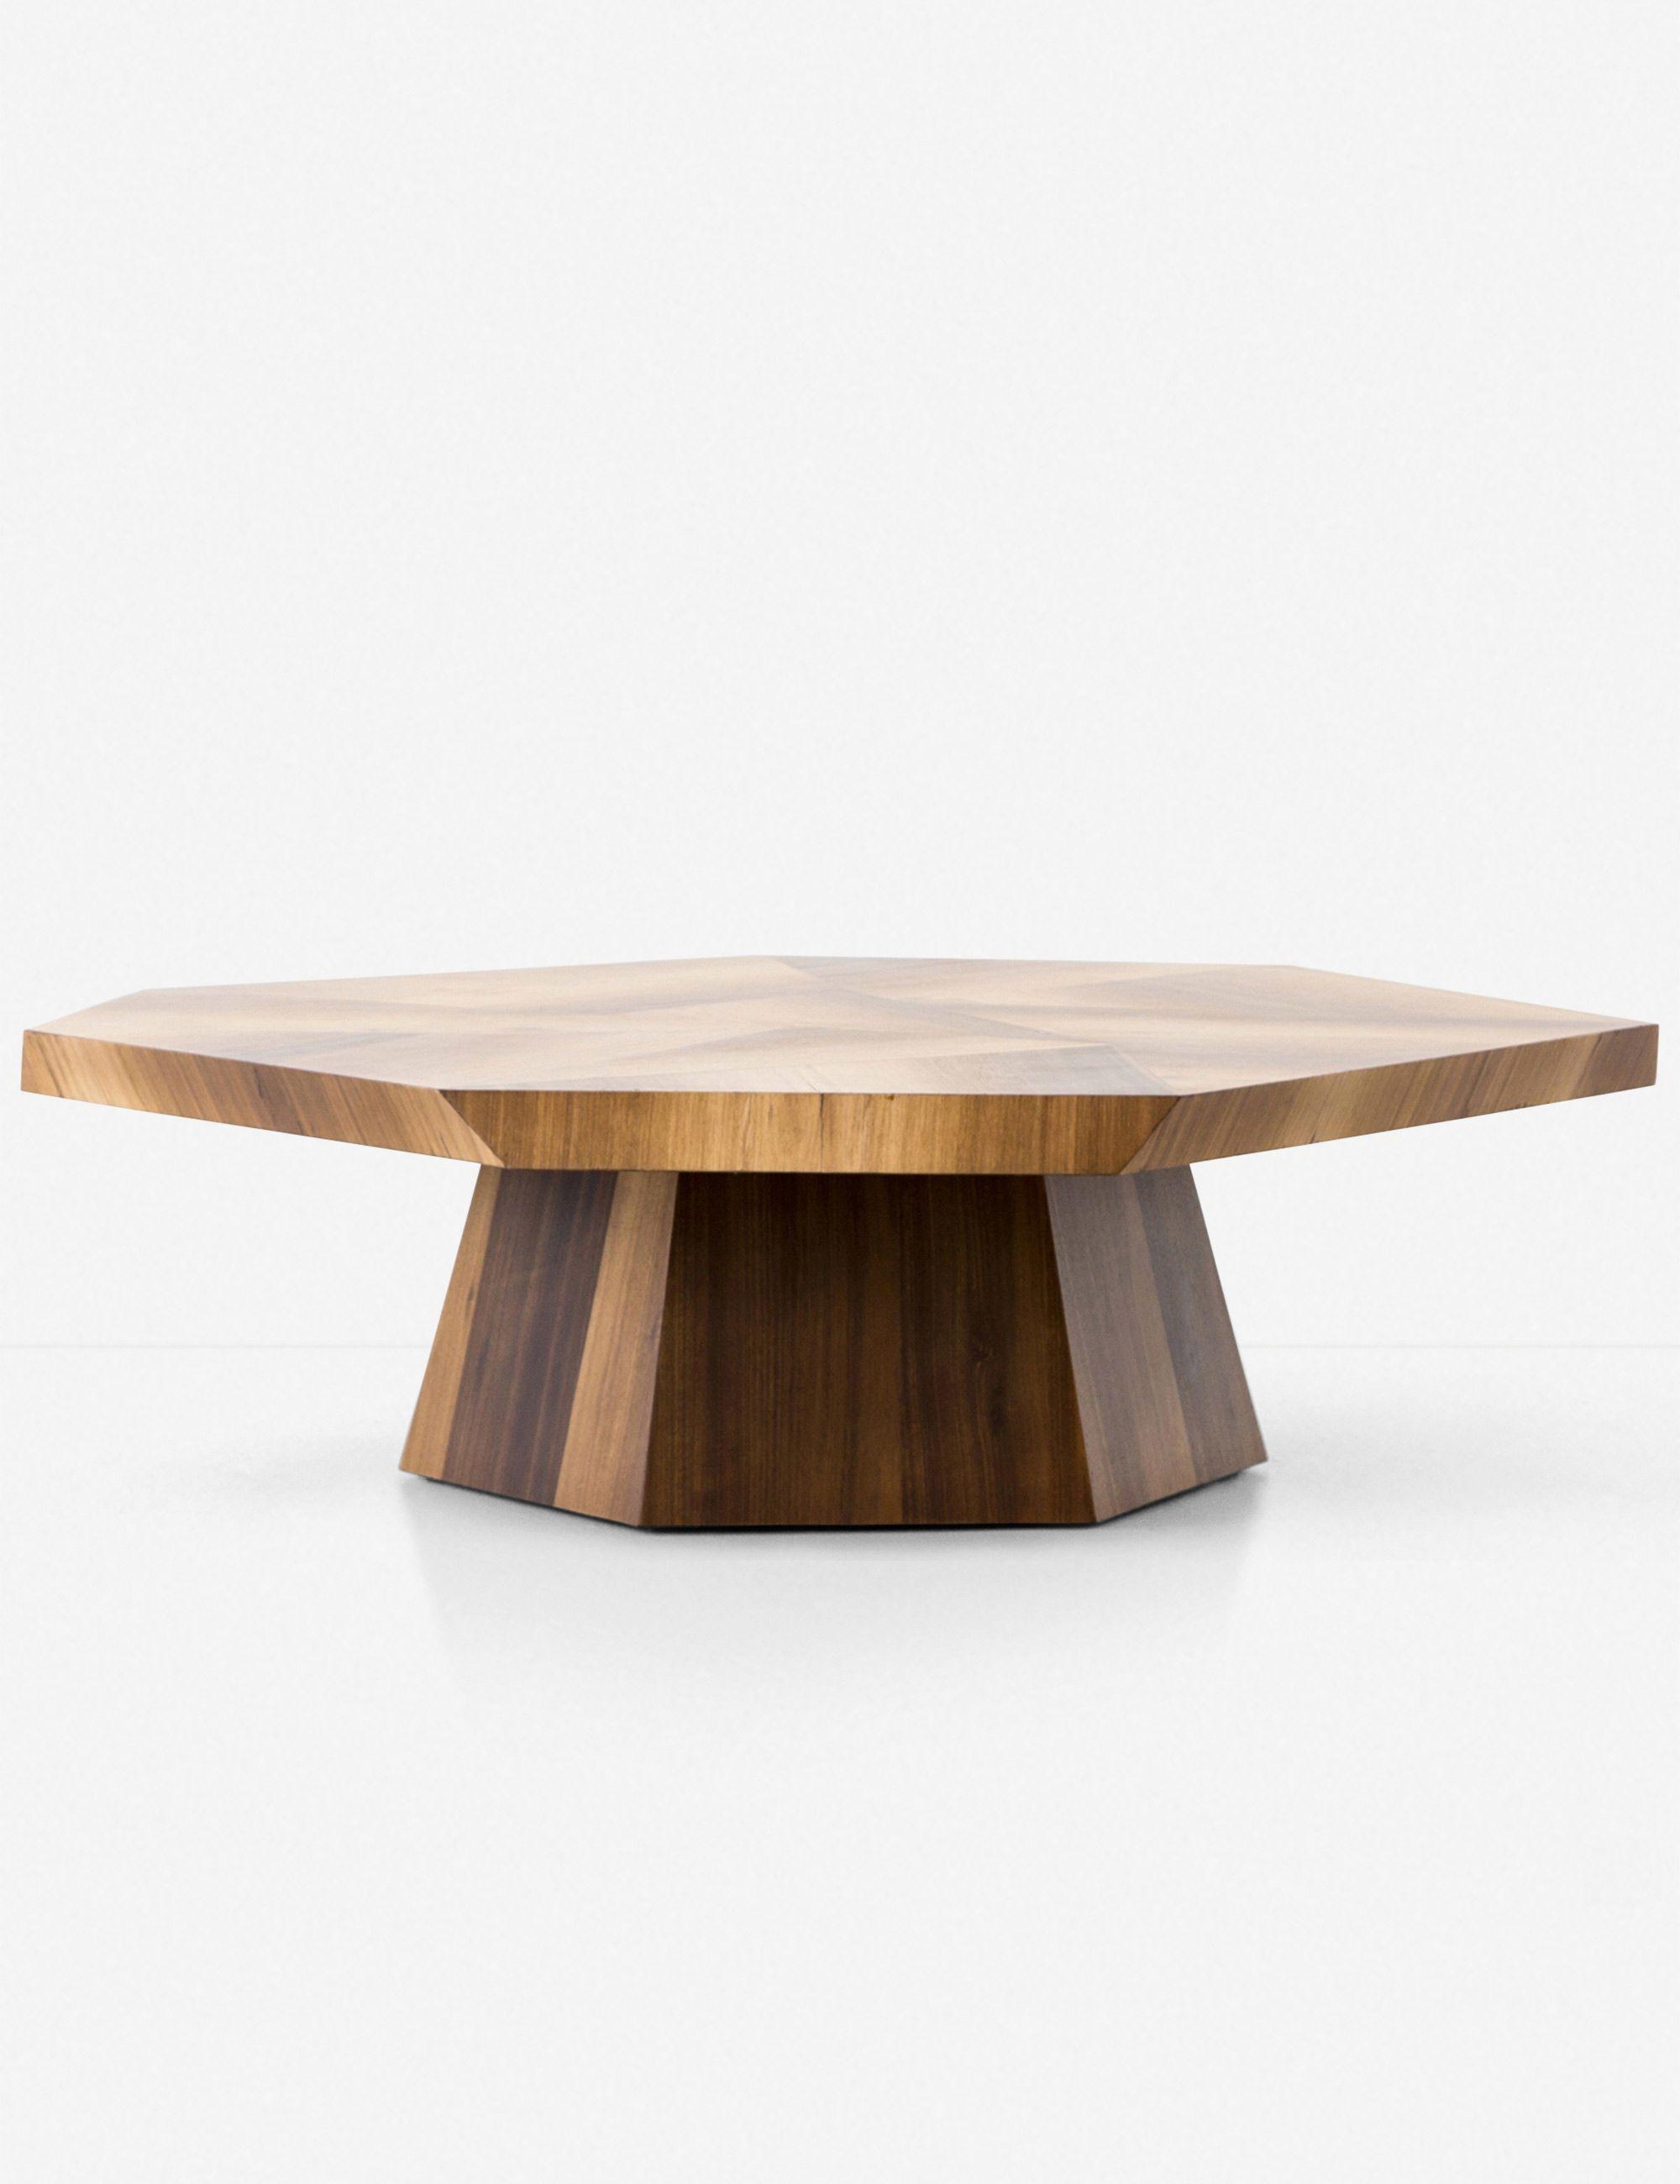 Balen Coffee Table Coffee Table Coffee Table Wood Unique Coffee Table [ 2600 x 2000 Pixel ]